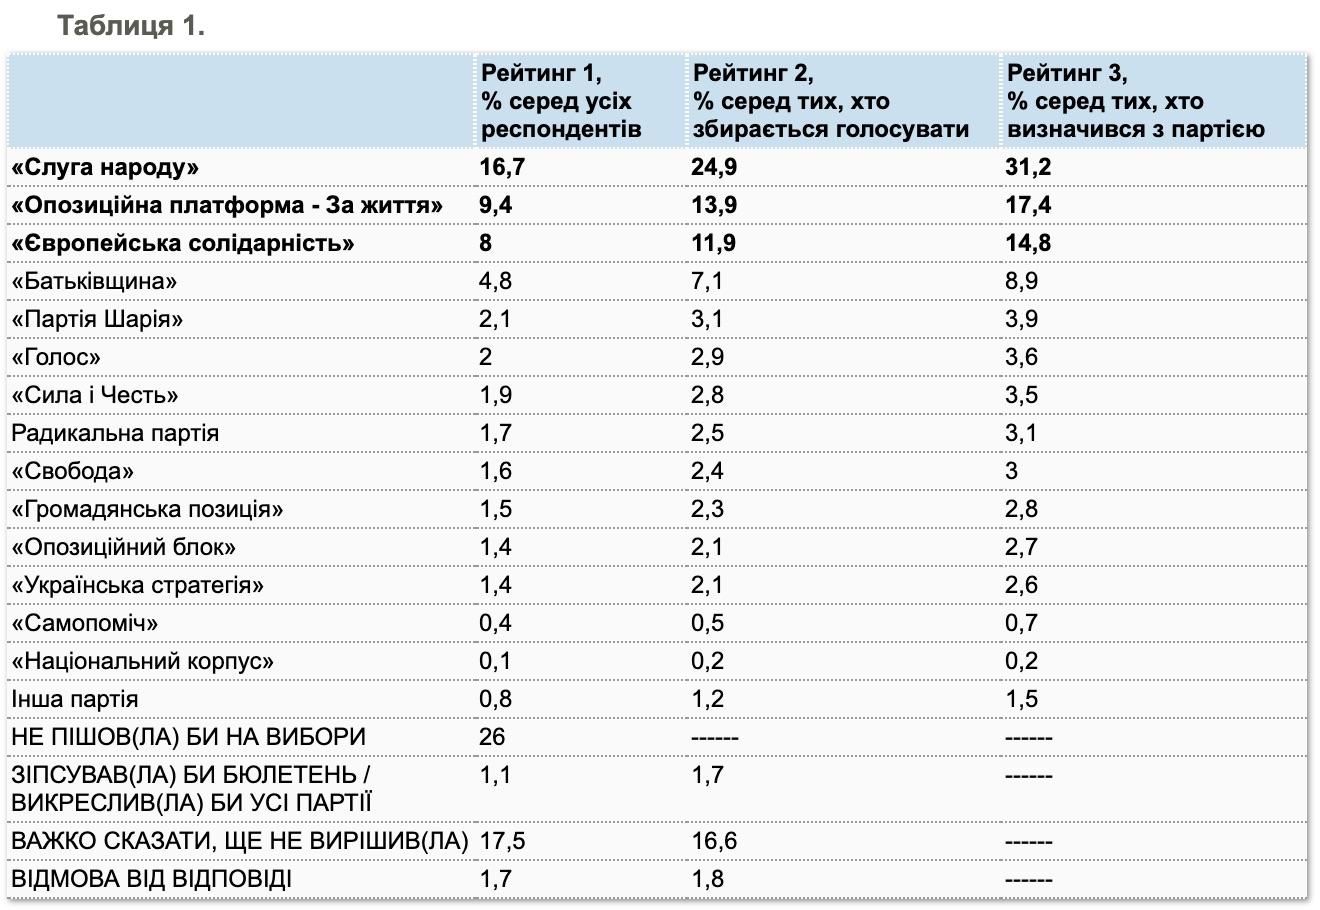 Рейтинг партий – середина мая 2020. Опрос и таблица КМИС